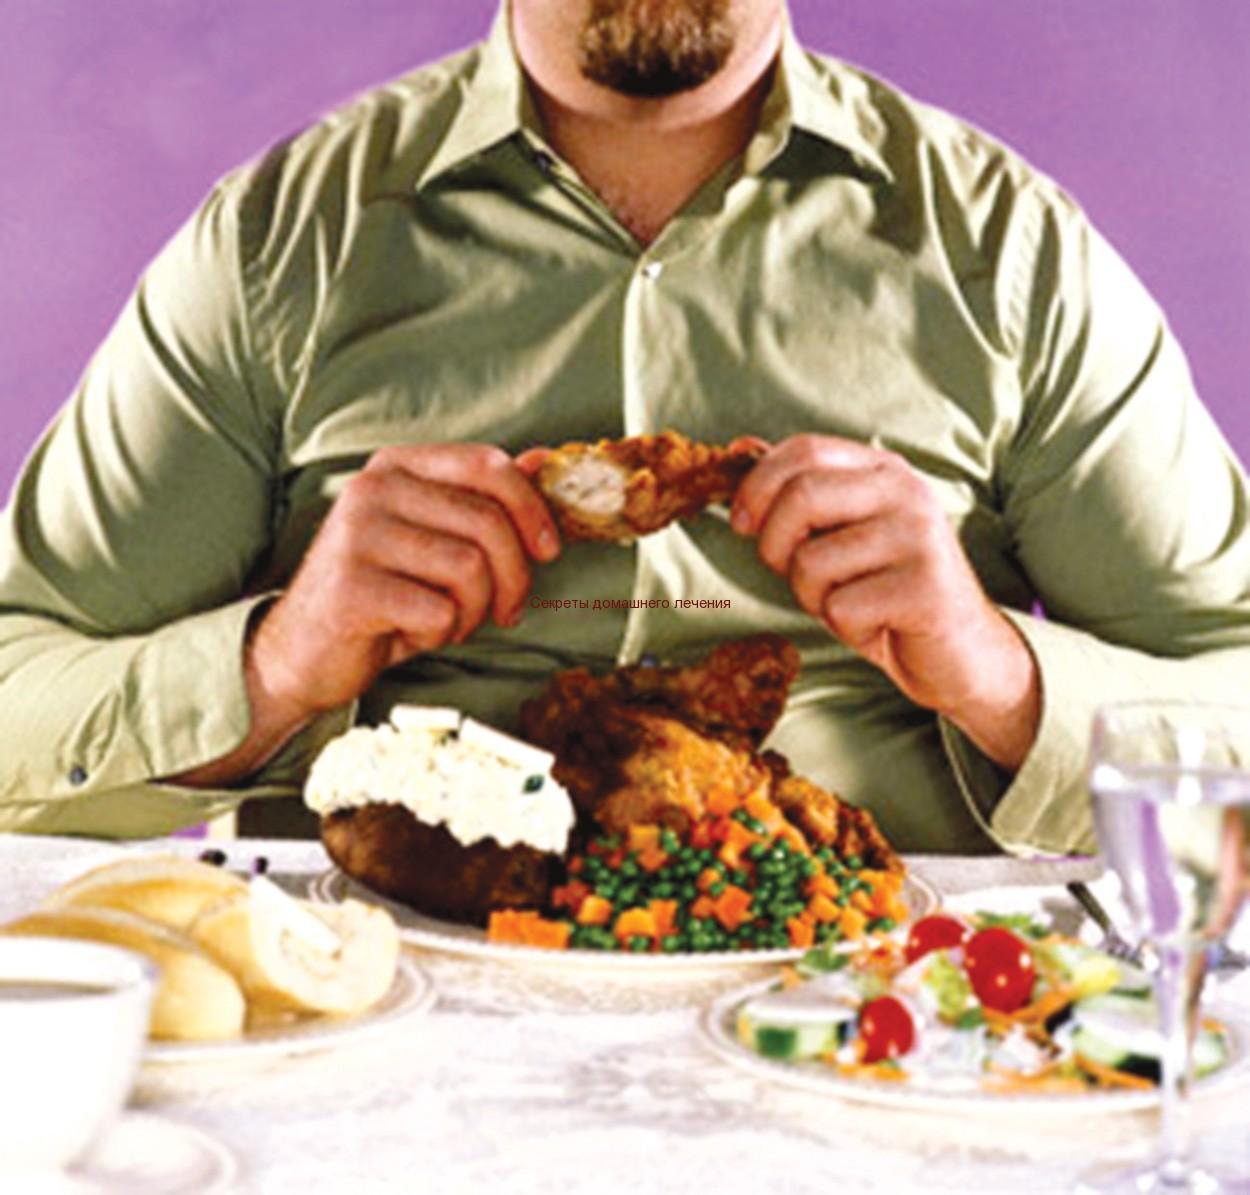 лечение холестерина в домашних условиях